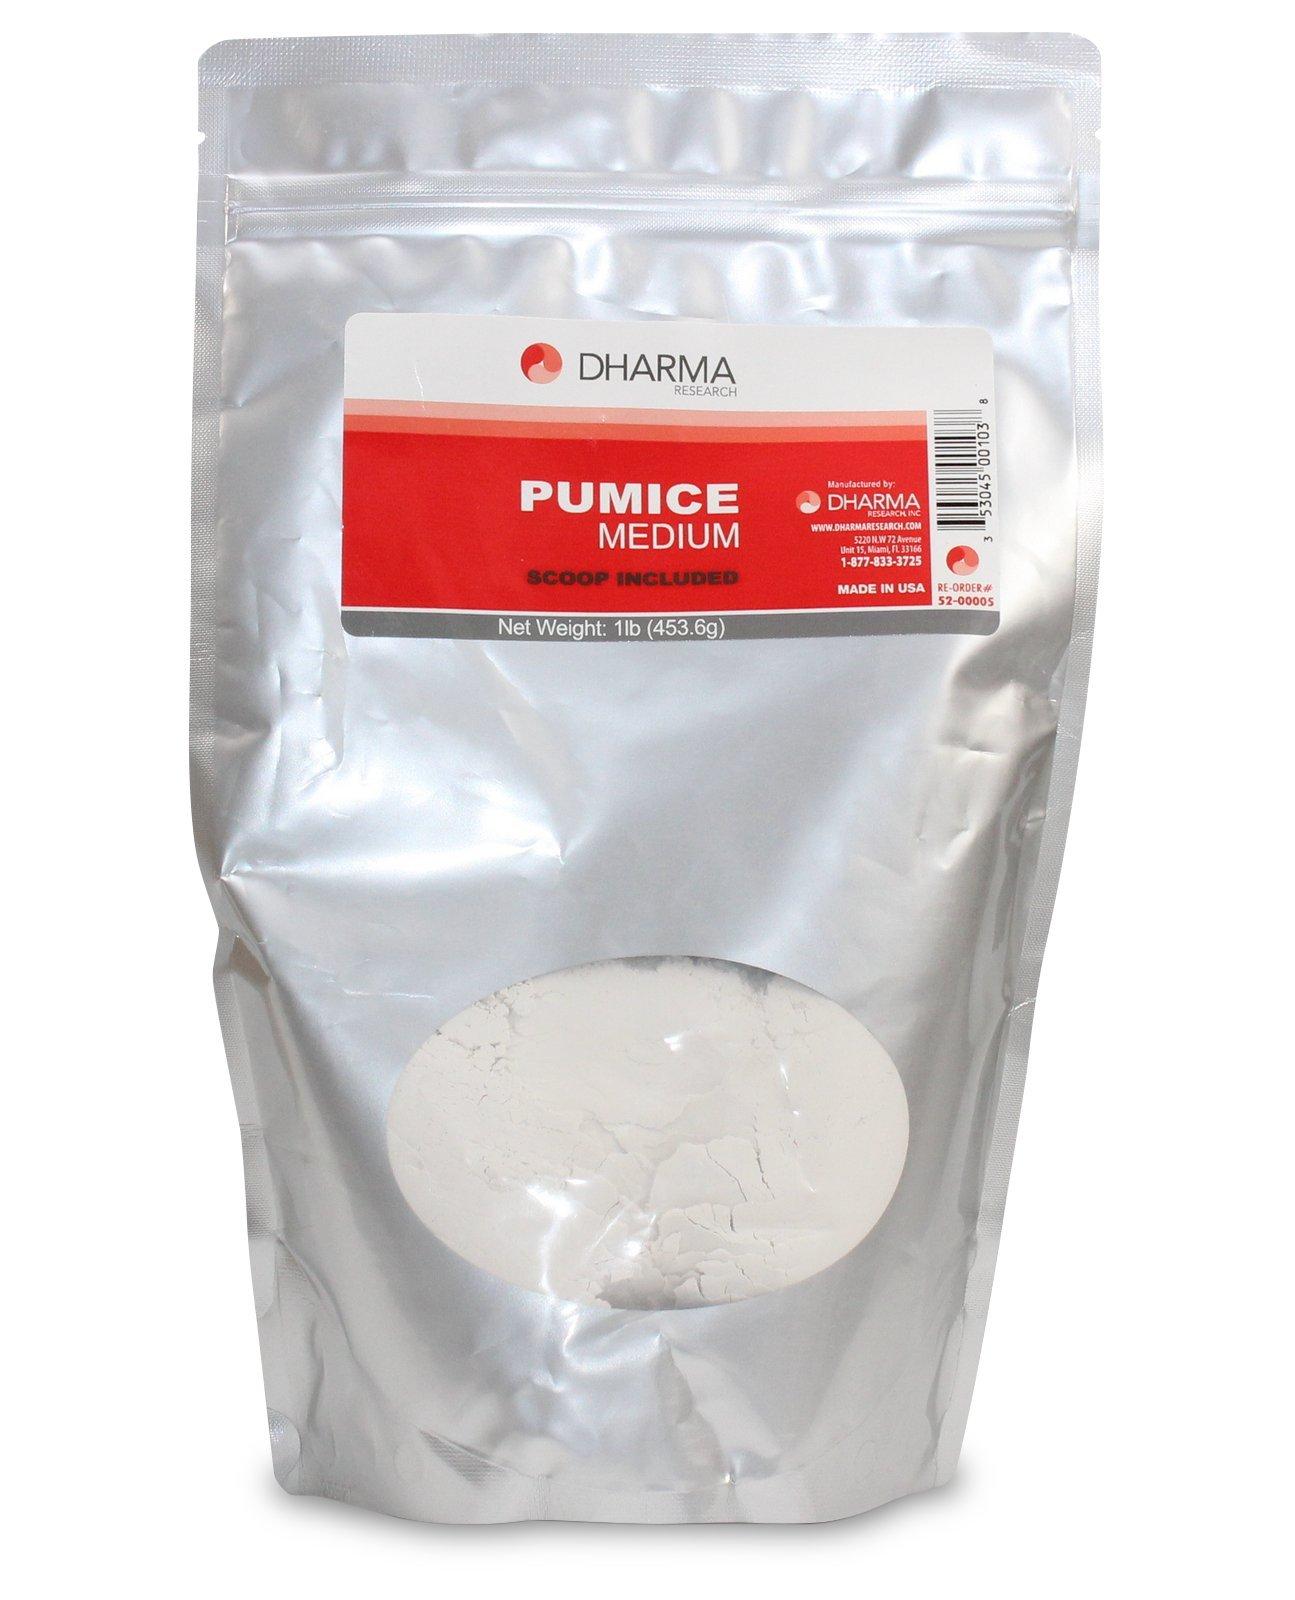 Dharma Pumice Medium Grit 1 lb